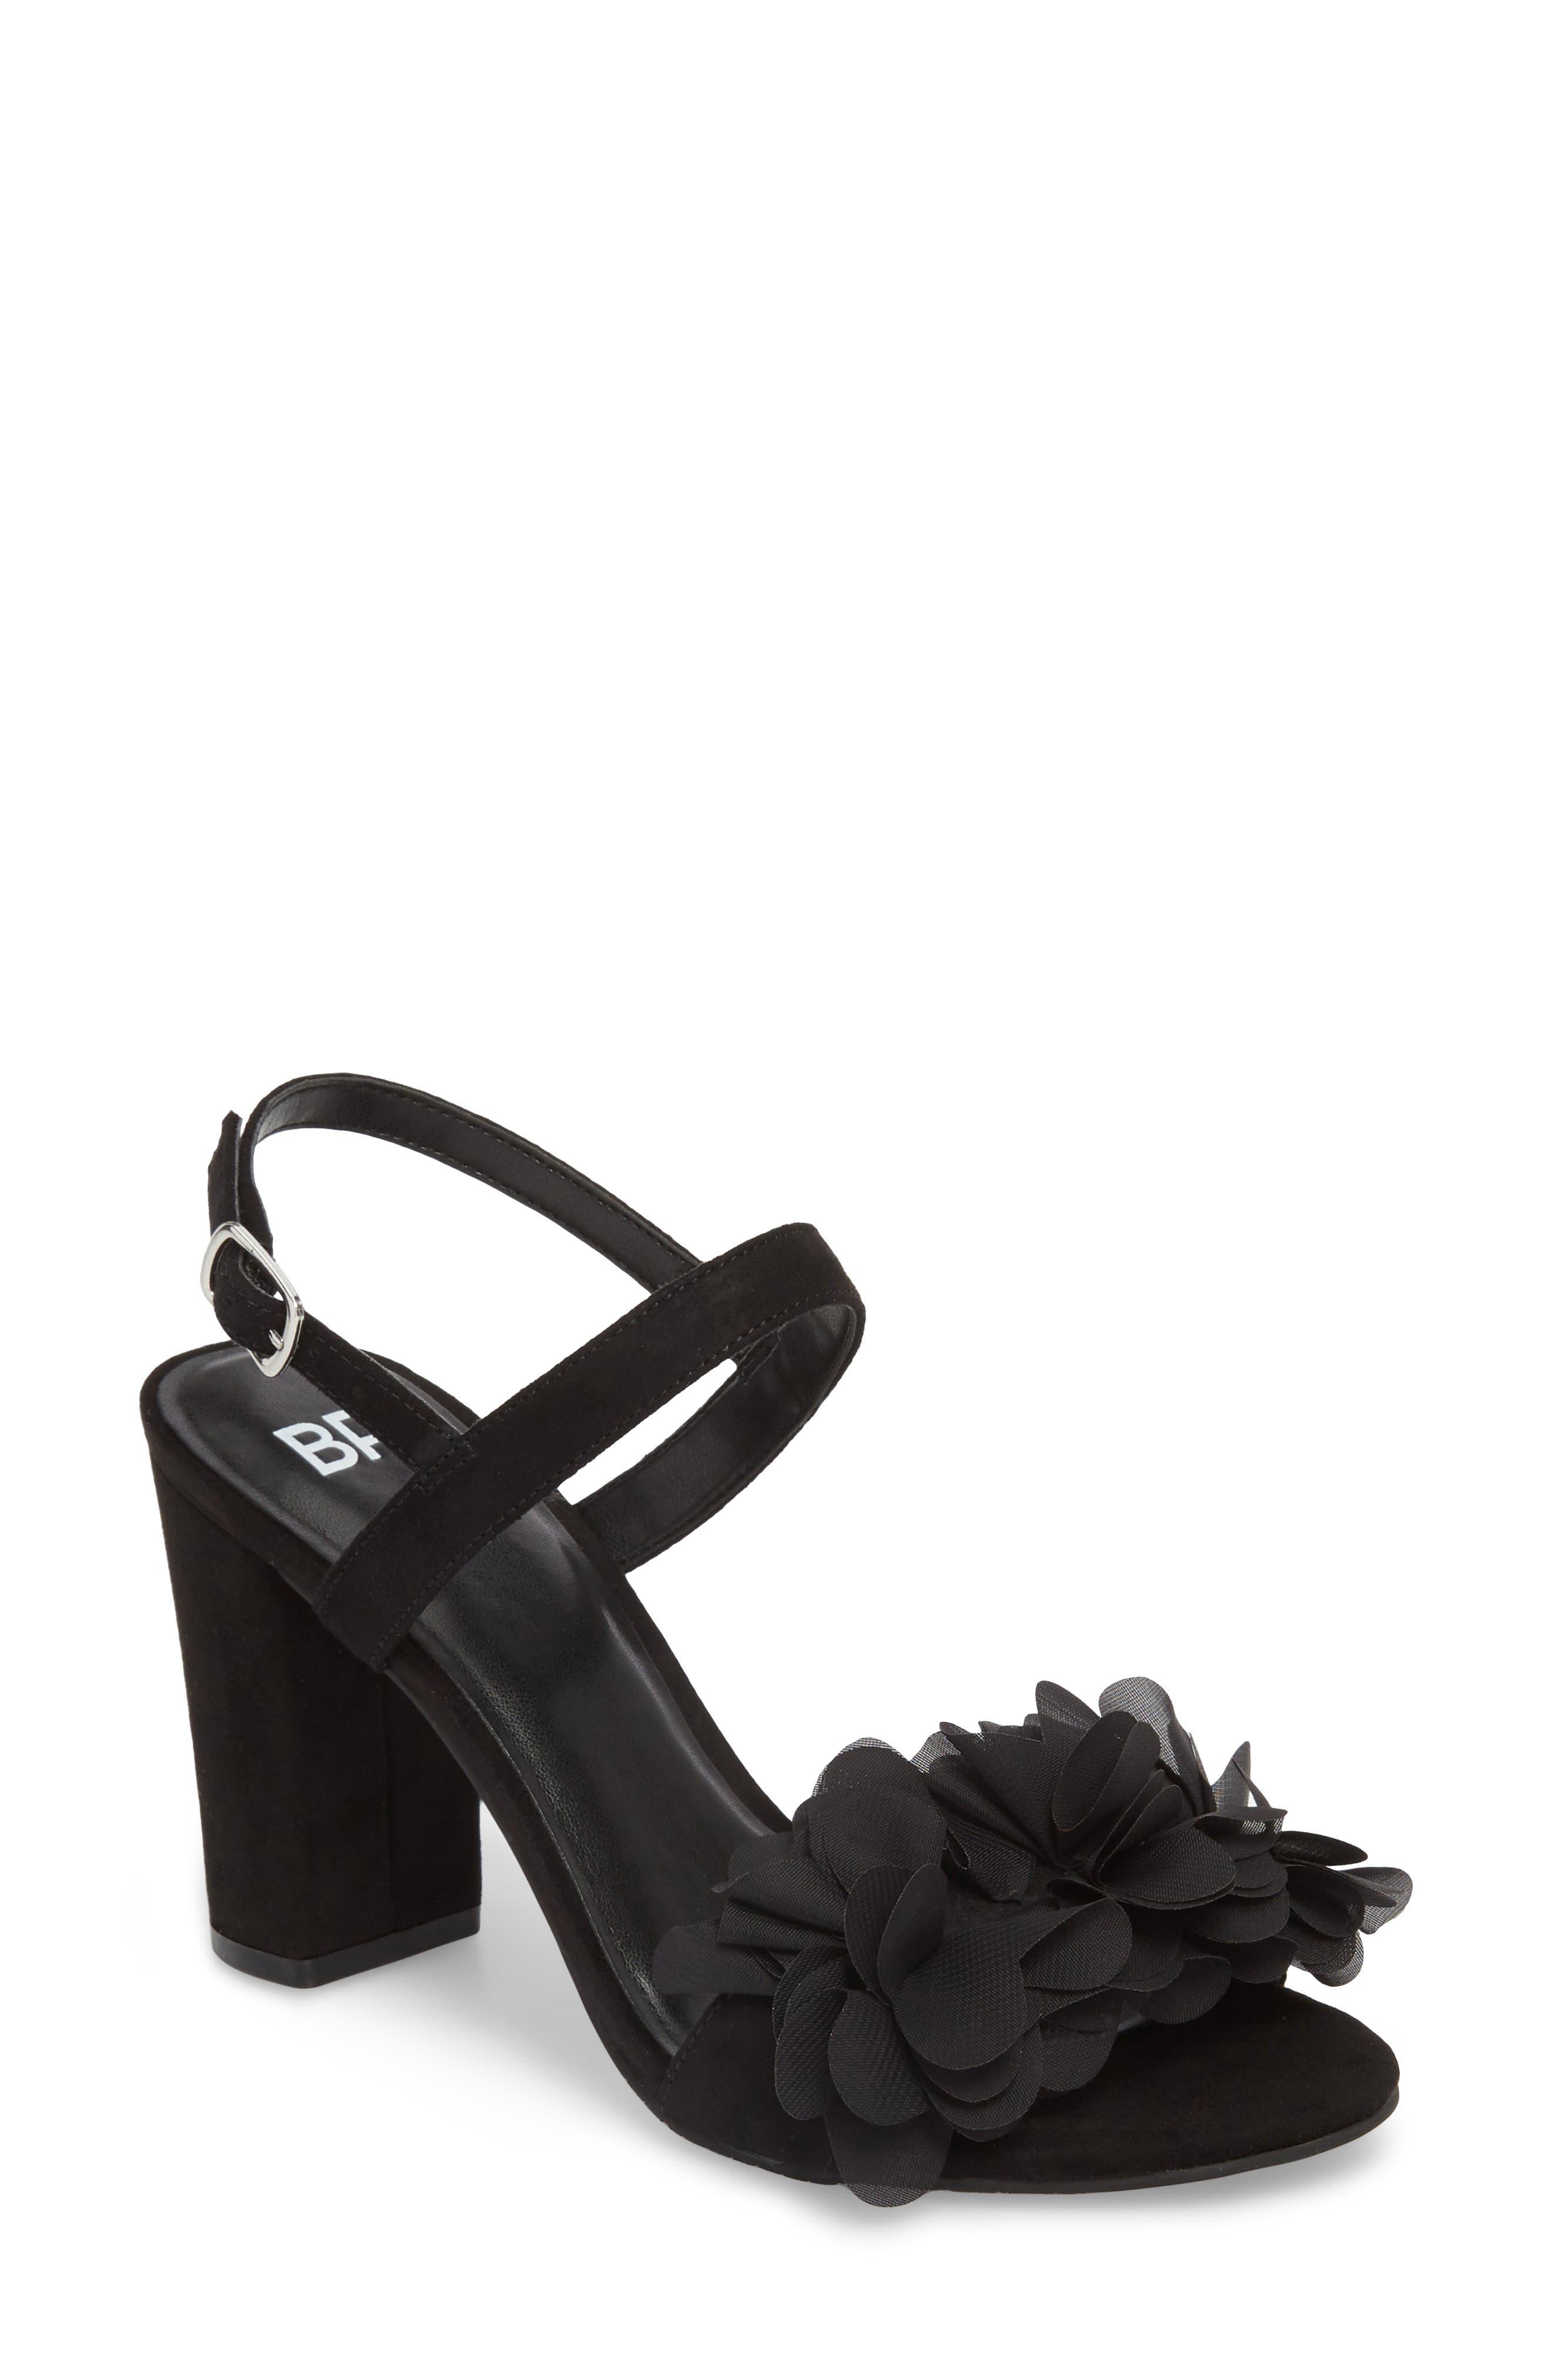 Lula Block Heel Slingback Sandal,                         Main,                         color, Black Flowers Fabric